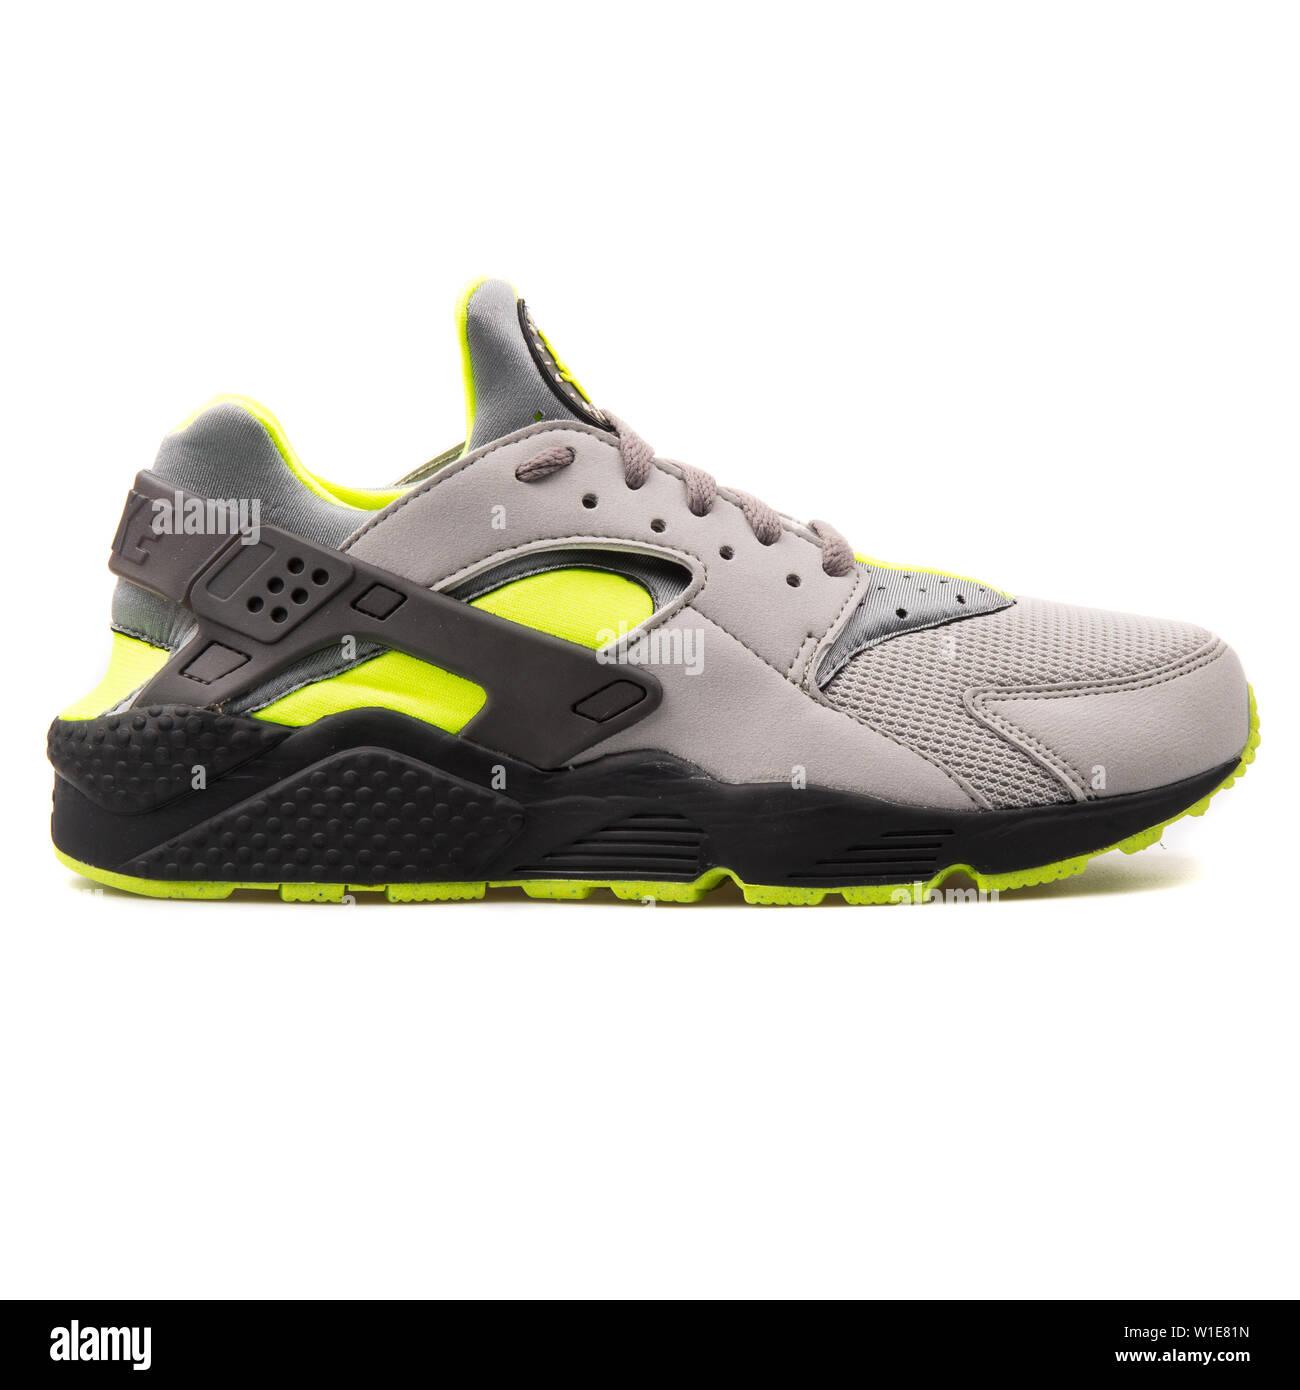 2017: Nike Air Huarache grey, black